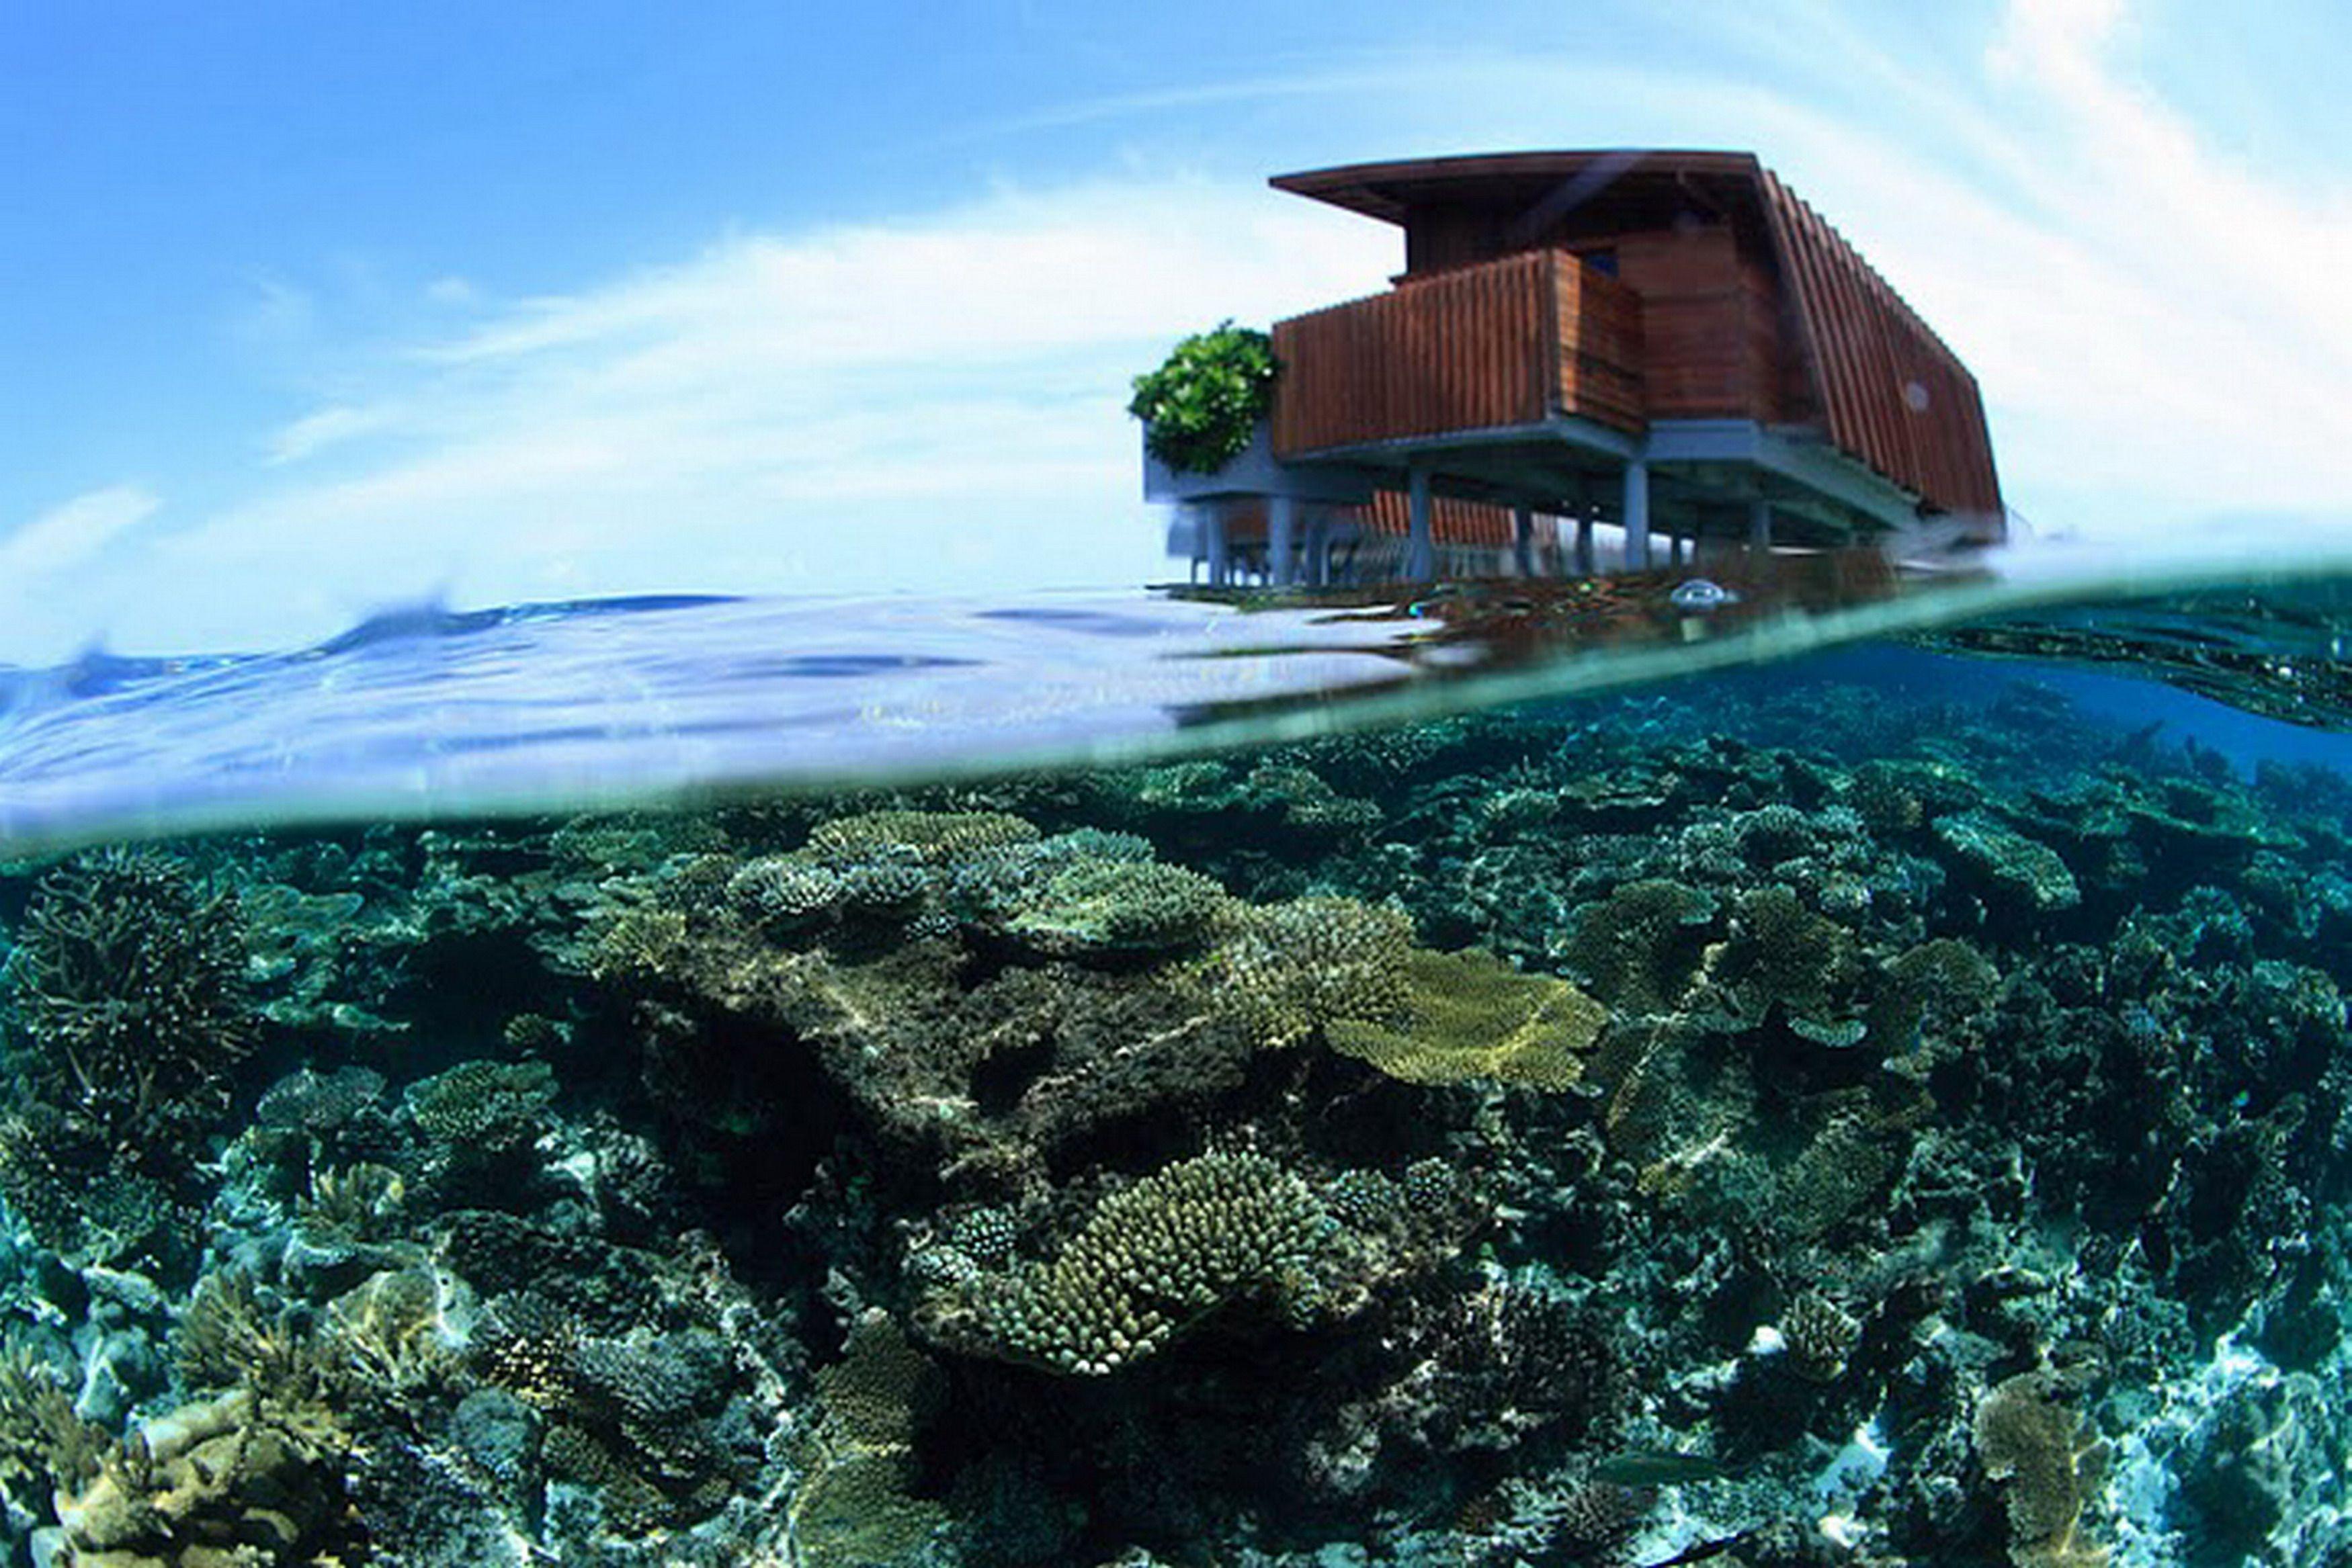 Underwater below the Park Villas at Park Hyatt Maldives Hadahaa, interior design by HBA/Hirsch Bedner Associates.